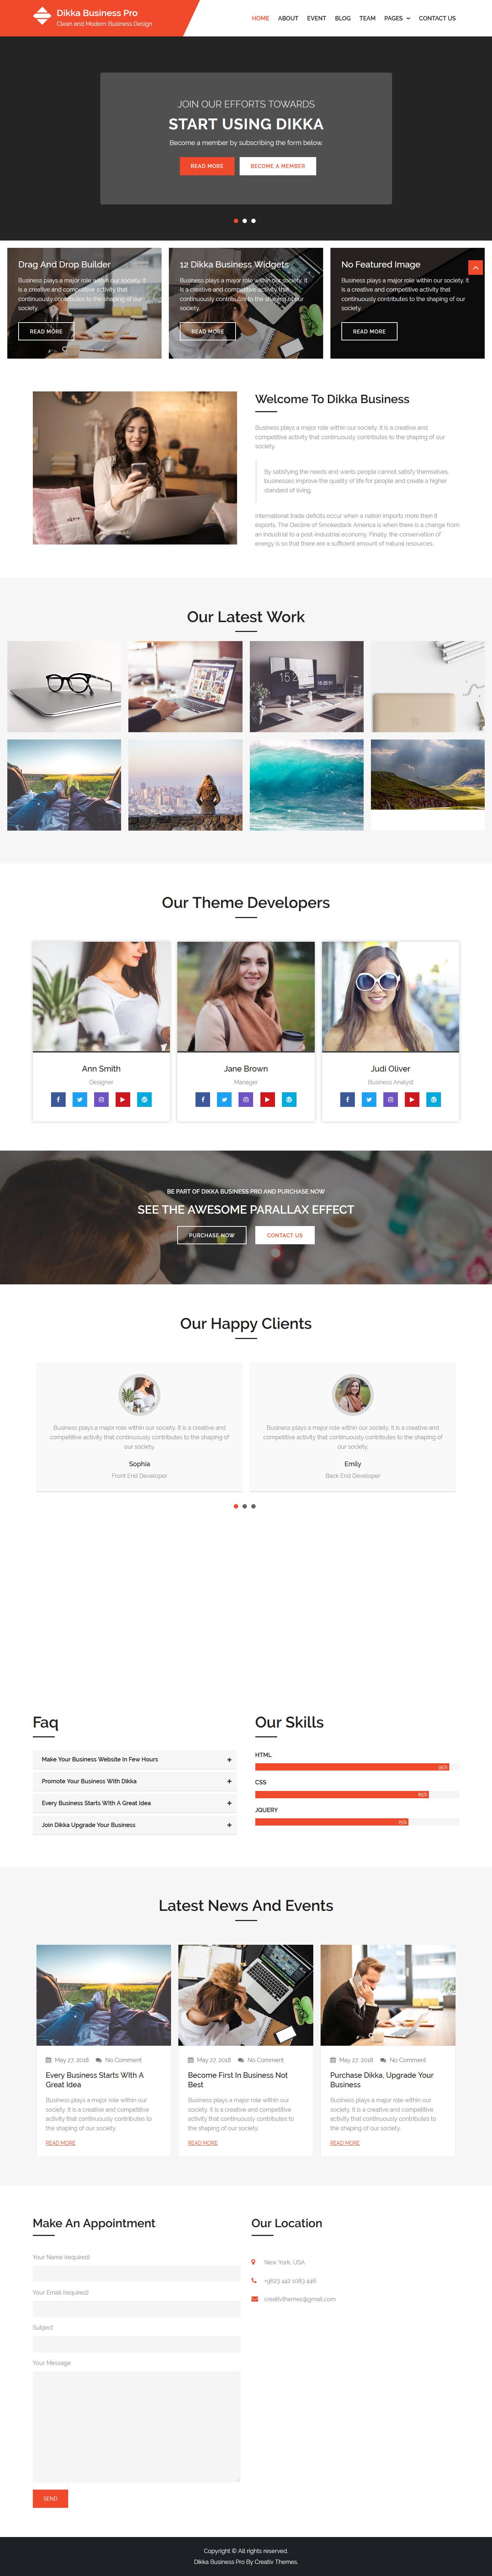 dikka business best free accounting wordpress theme - 10+ Best Free Accounting WordPress Themes